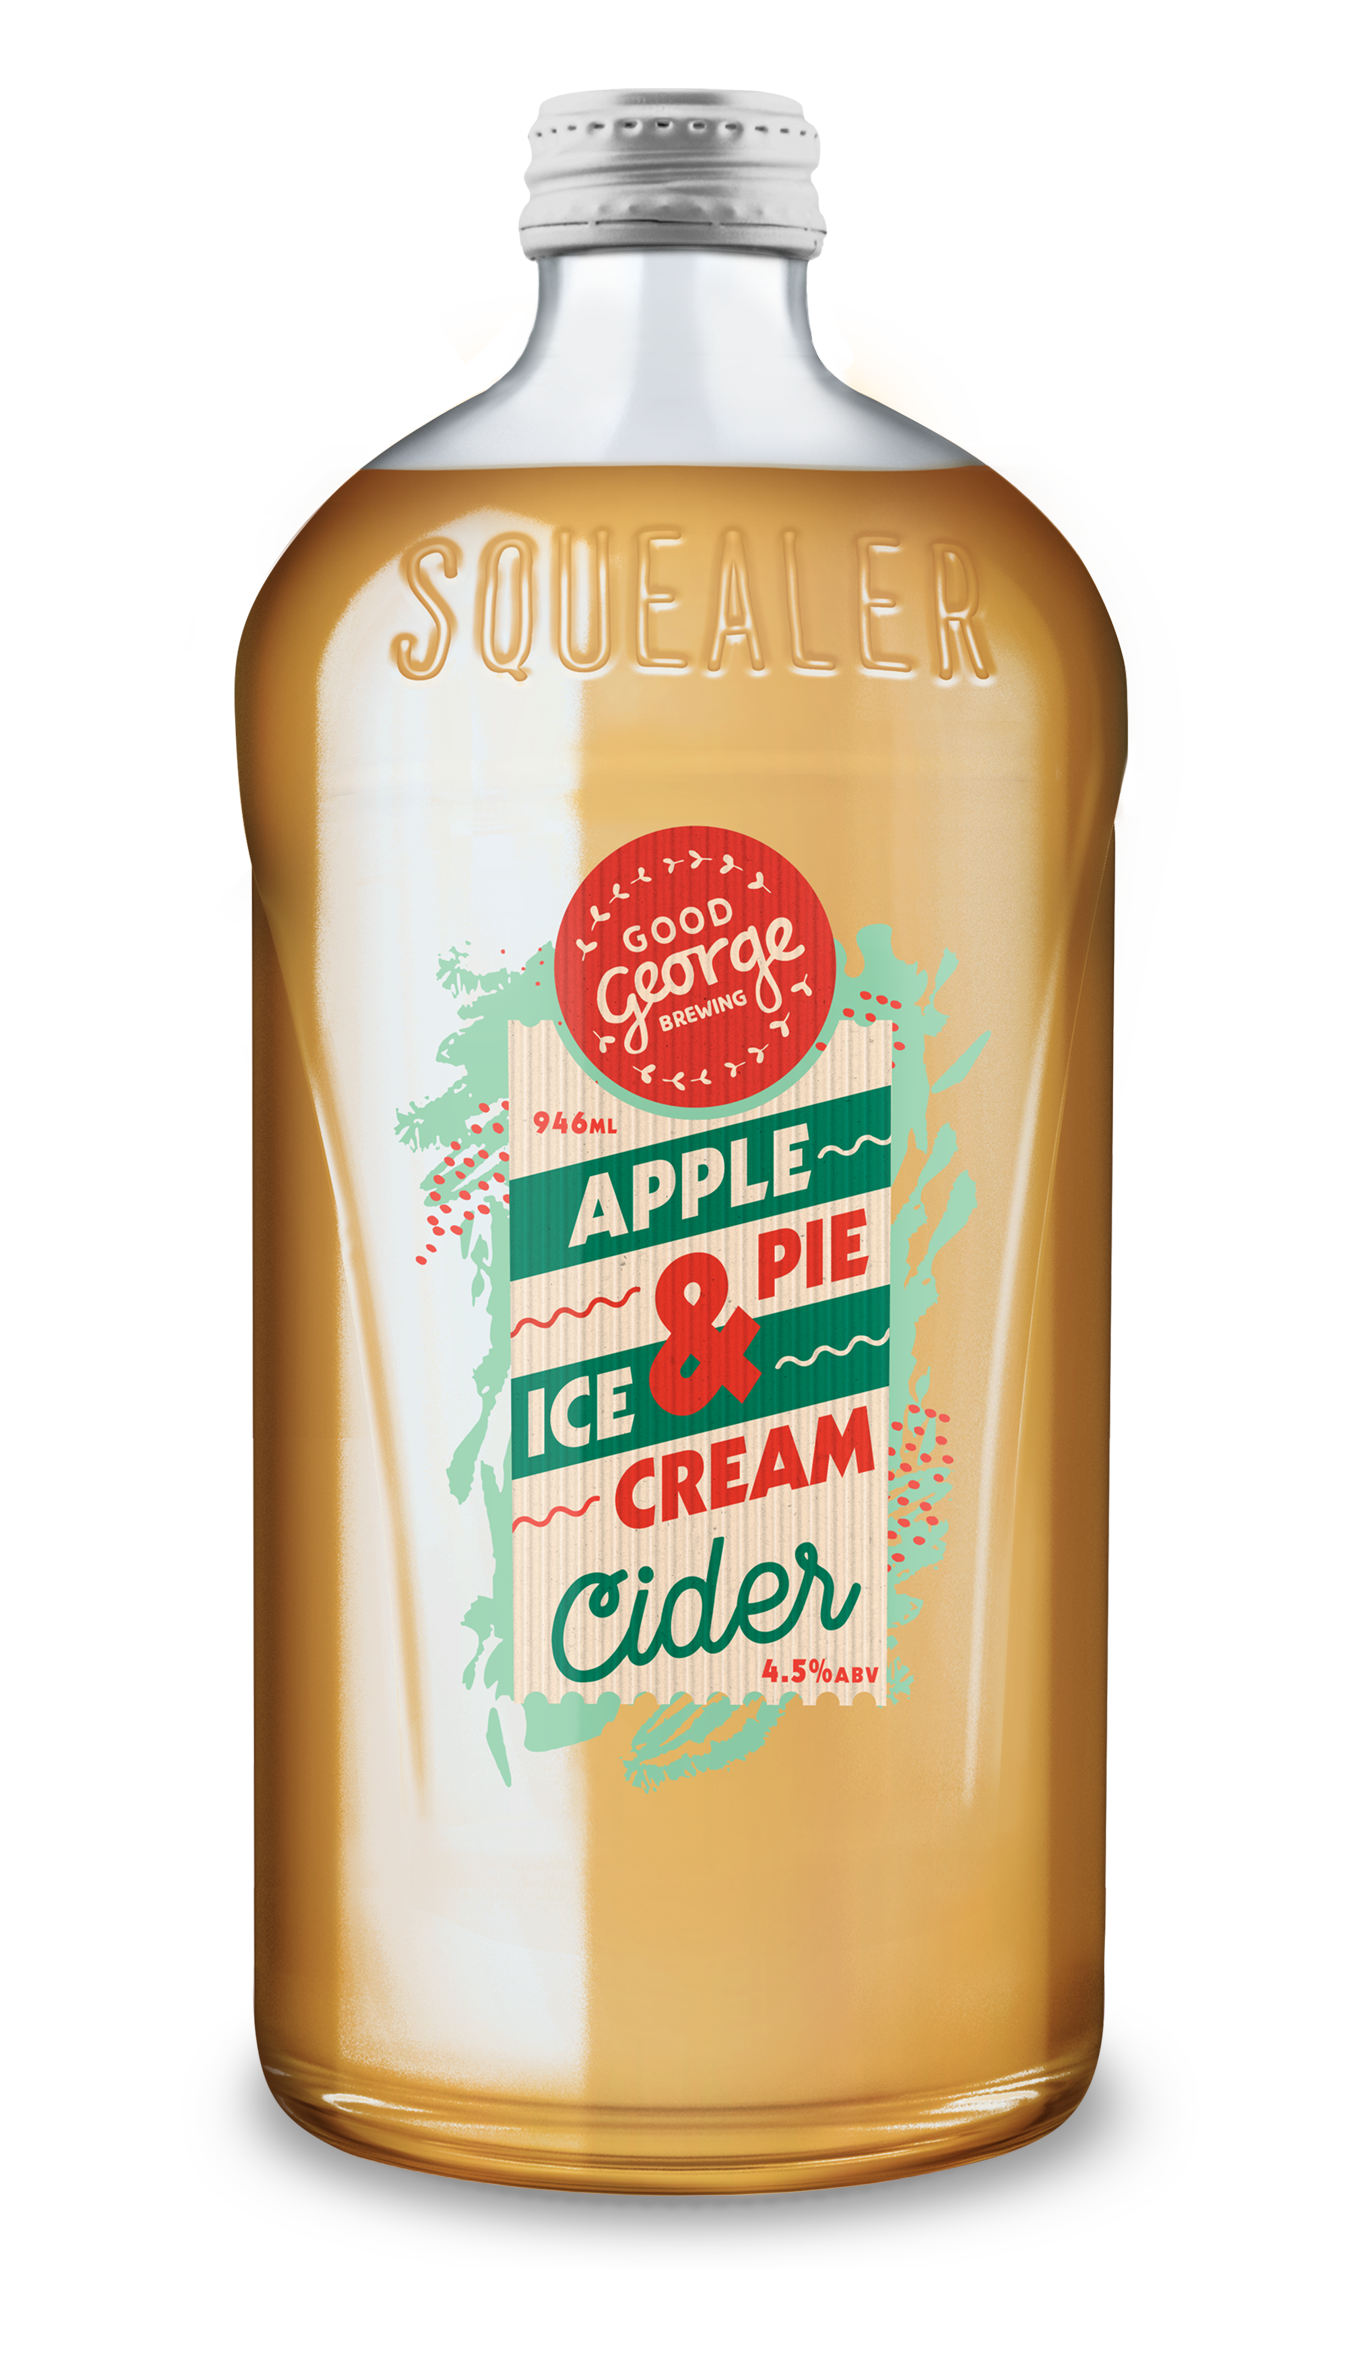 Good George Apple Pie and Ice Cream Cider